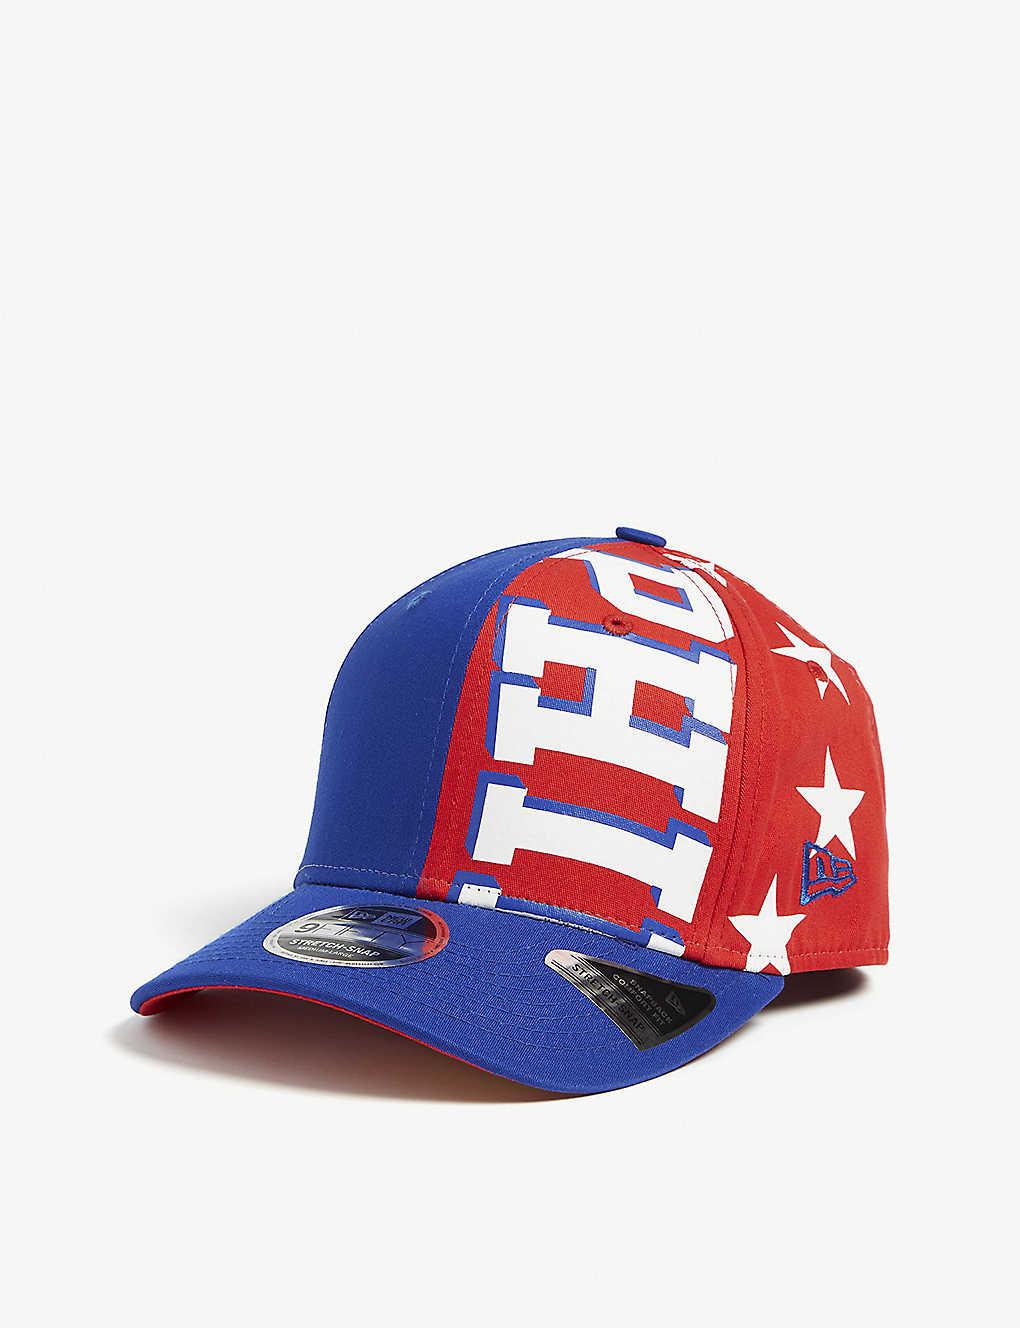 best cheap 07941 434ea Philadelphia 76ers 9Fifty cap - Blue red ...